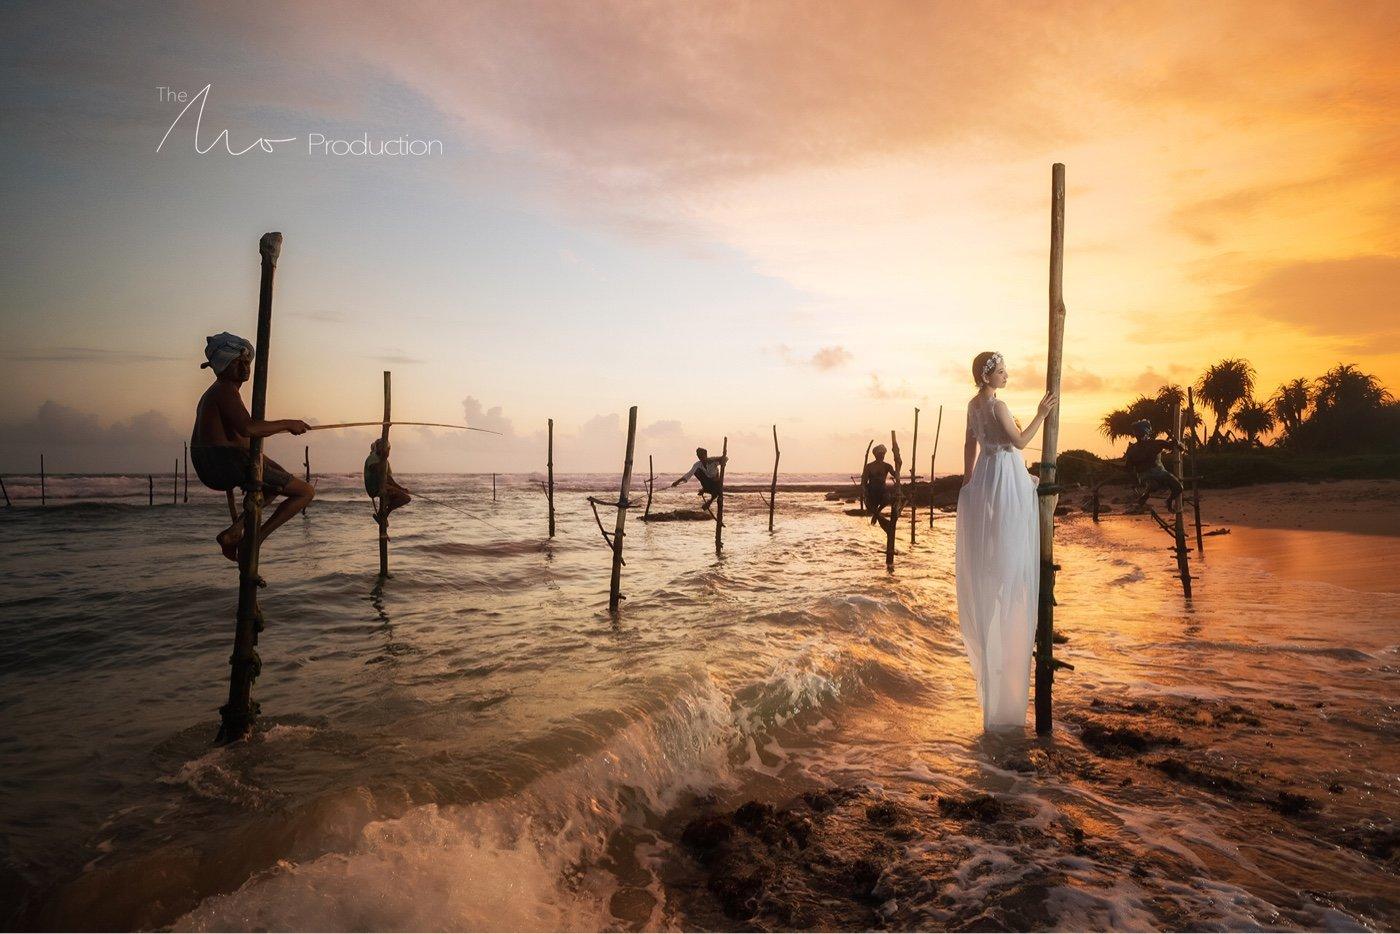 MoFoTo 斯里兰卡旅拍10